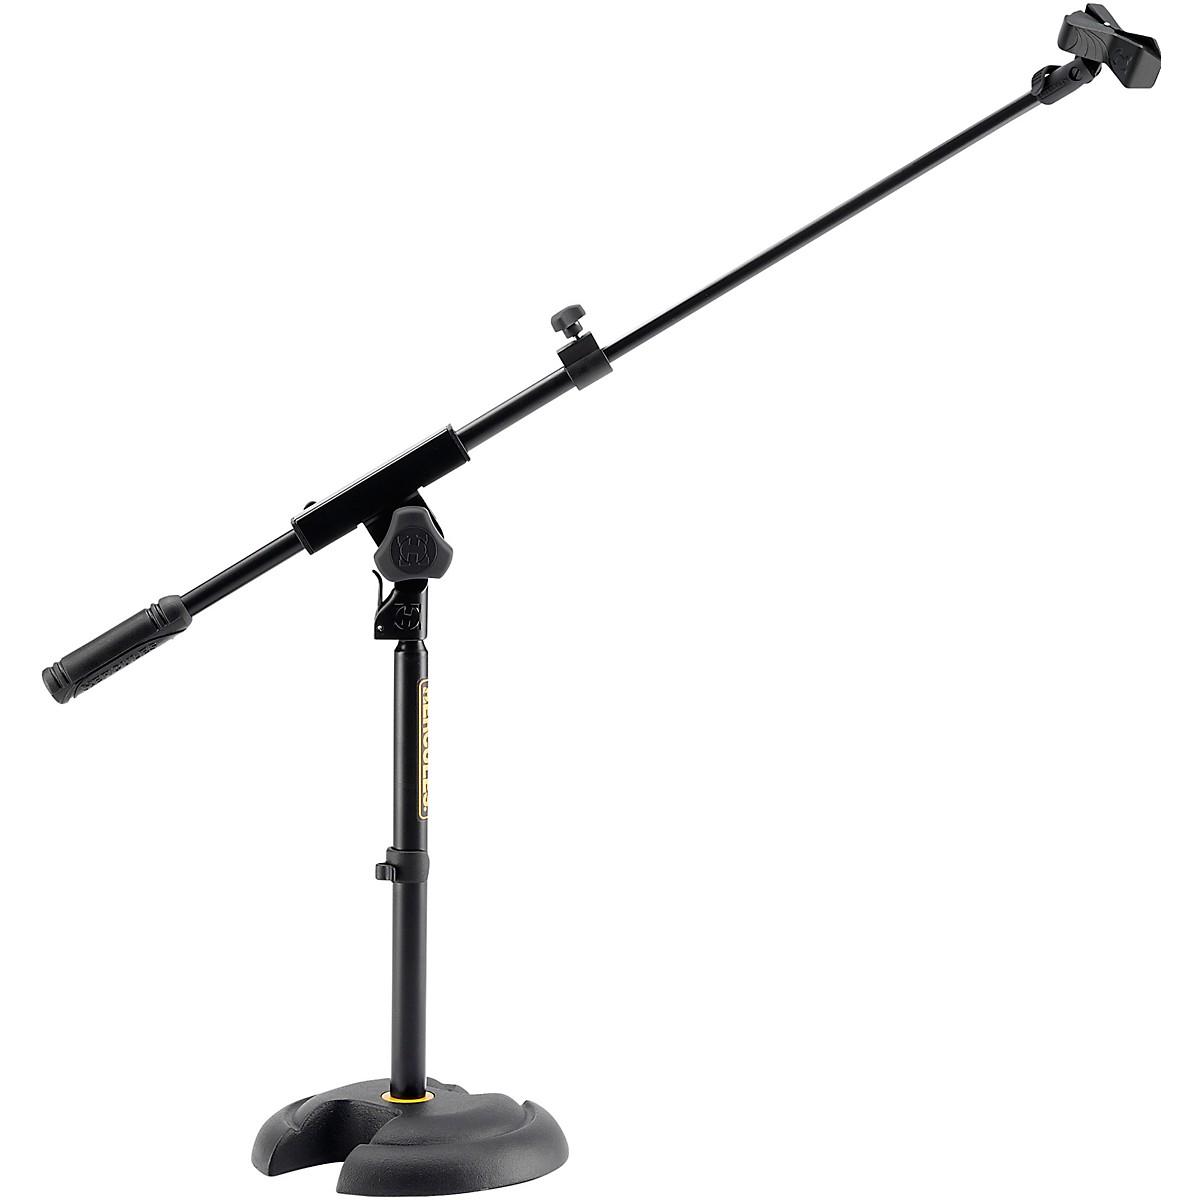 Hercules Low-Profile, Short Microphone Boom Stand